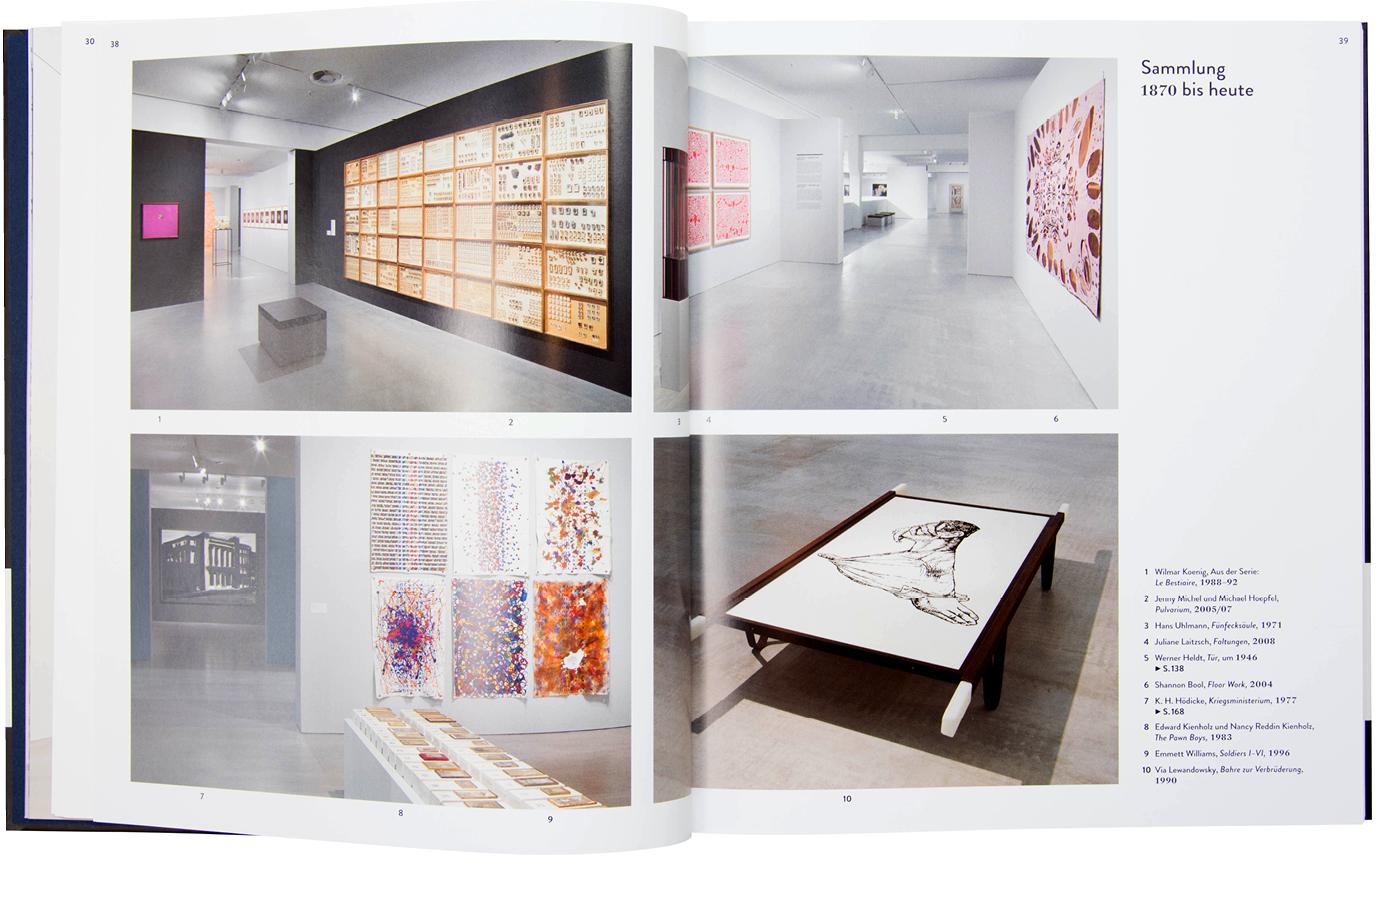 http://e-o-t.de/wordpress/wp-content/uploads/2017/06/2015_eot-BG-Jubilaeum-Book-8.jpg